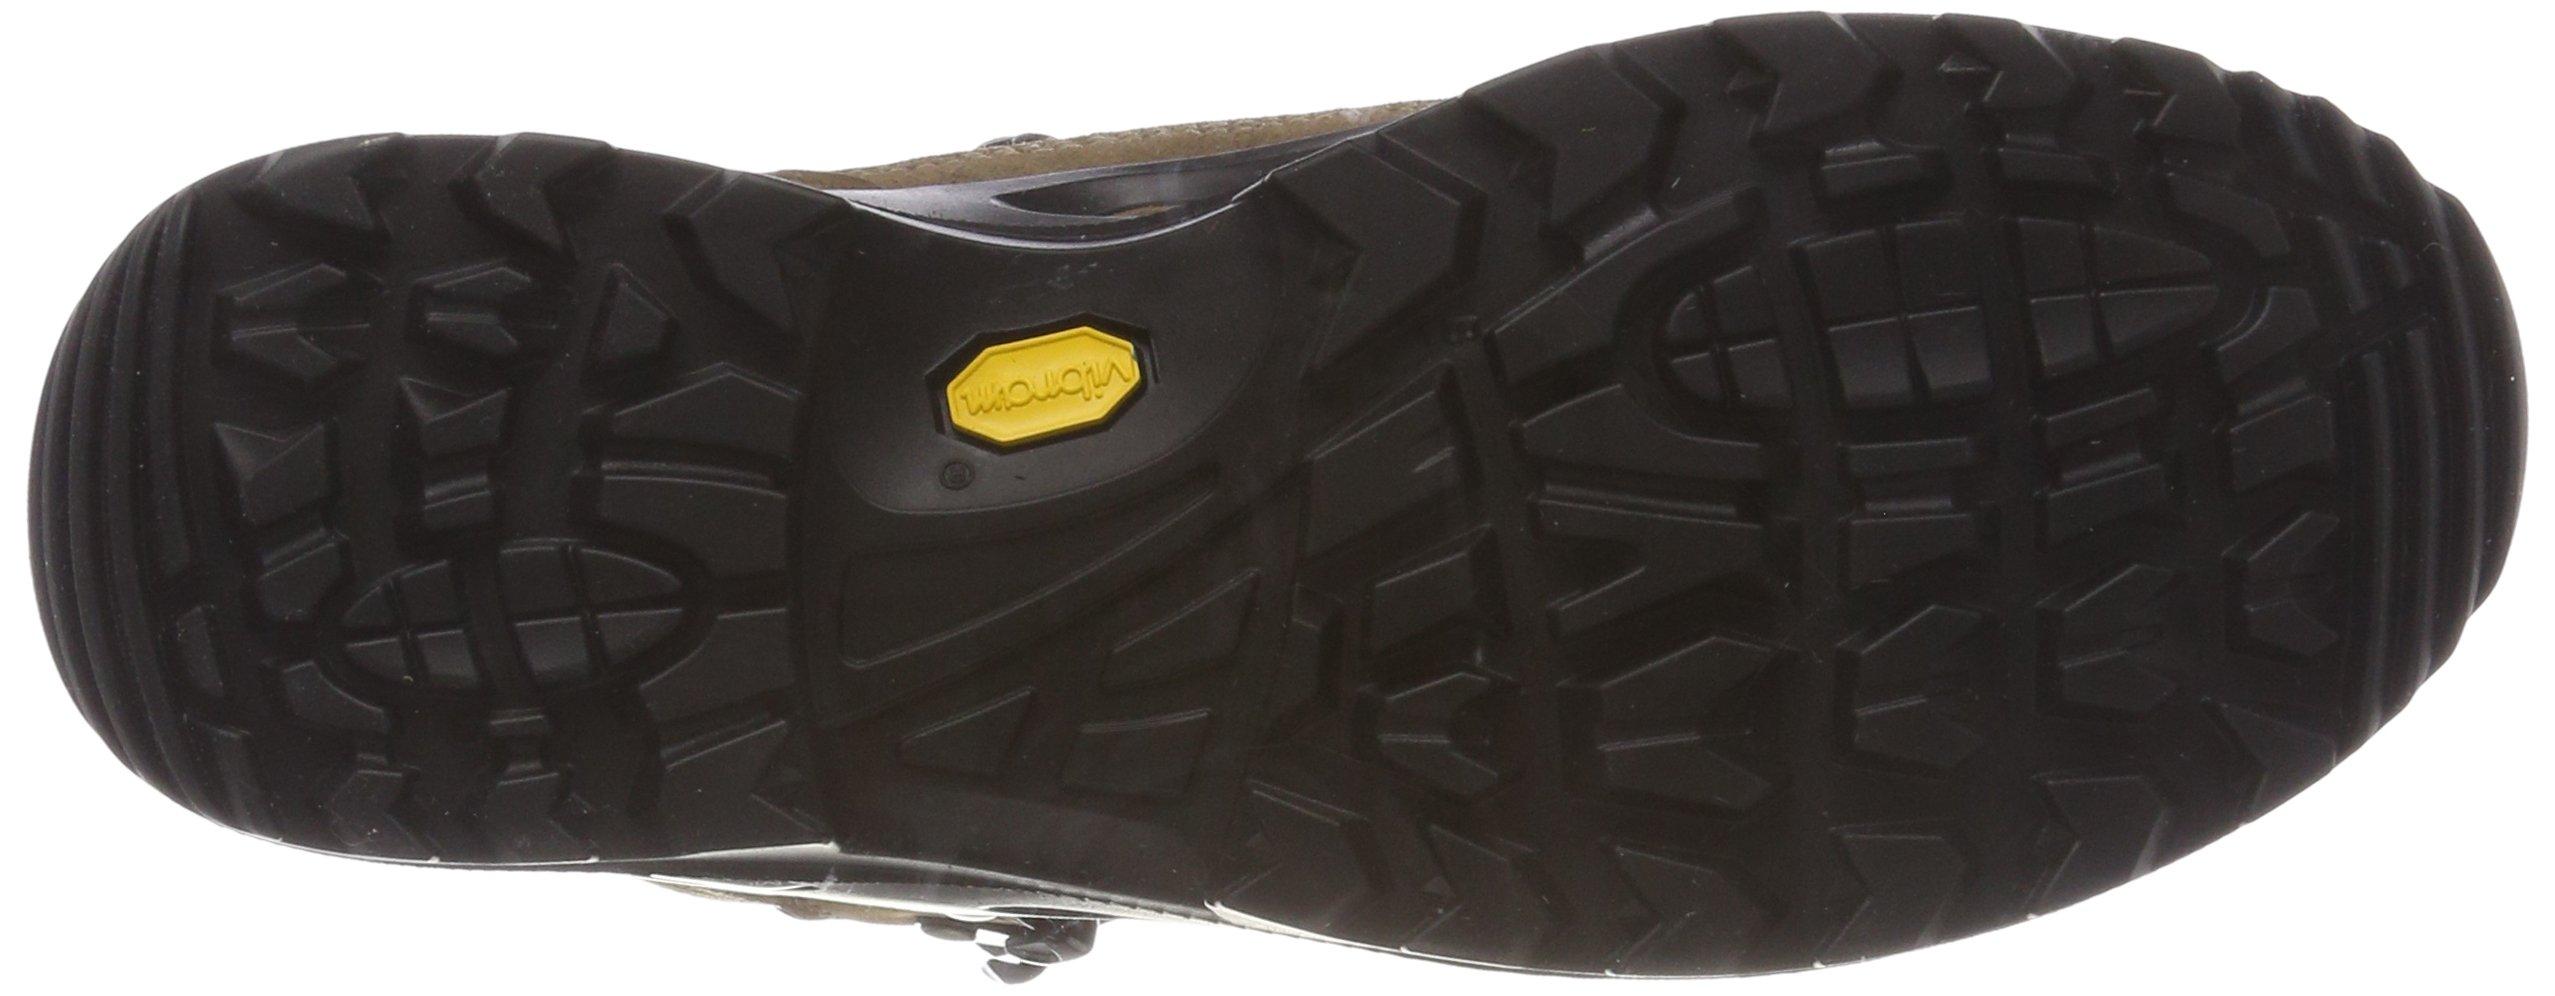 71375IniiyL - Lowa RENAGADE GTX MID Ws 320945/9768 Unisex-Adult Hiking Boot